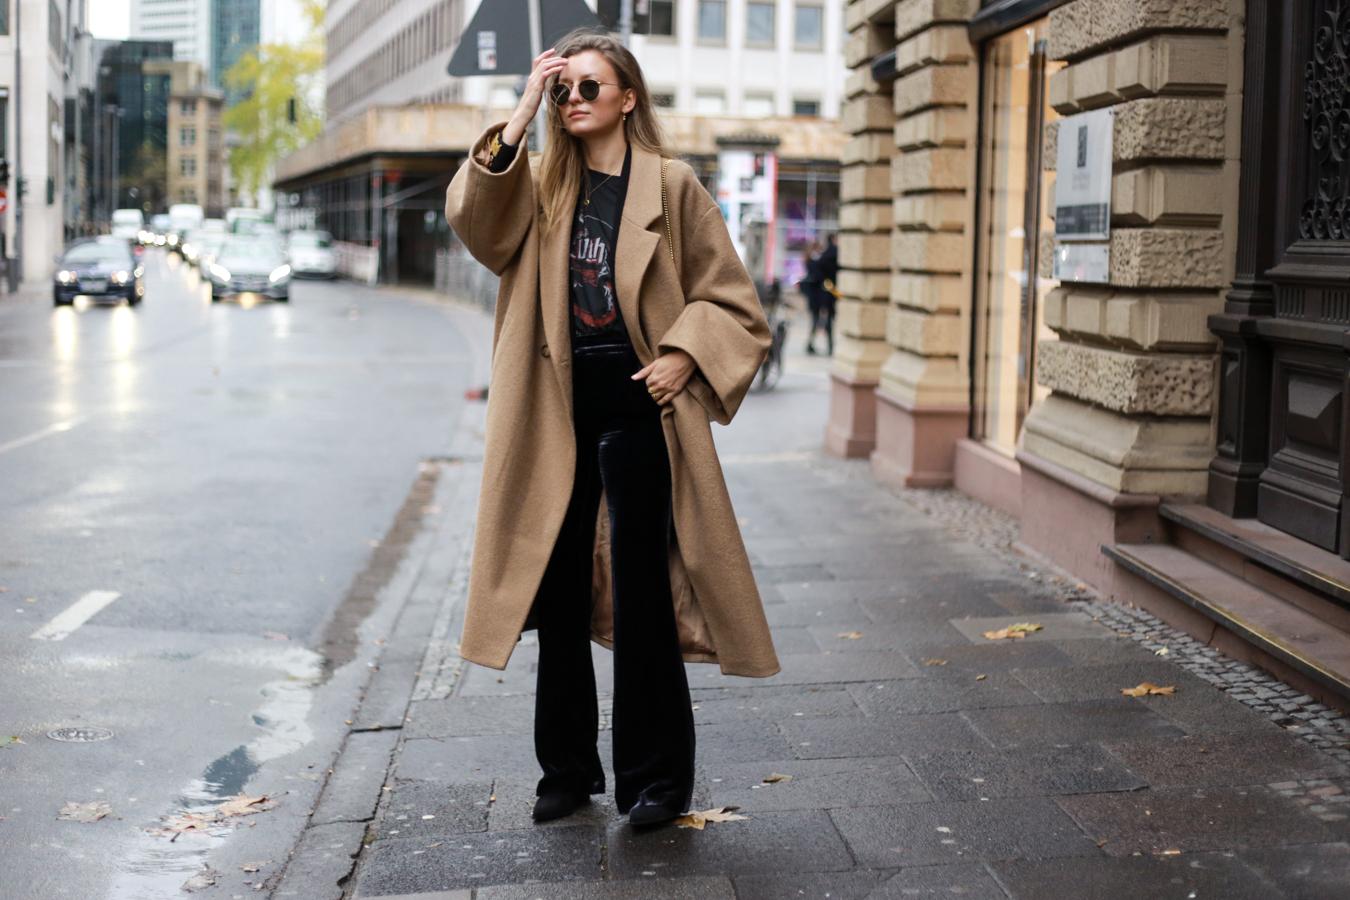 velvet-band-shirt-camel-coat-outfit-livia-auer-6496